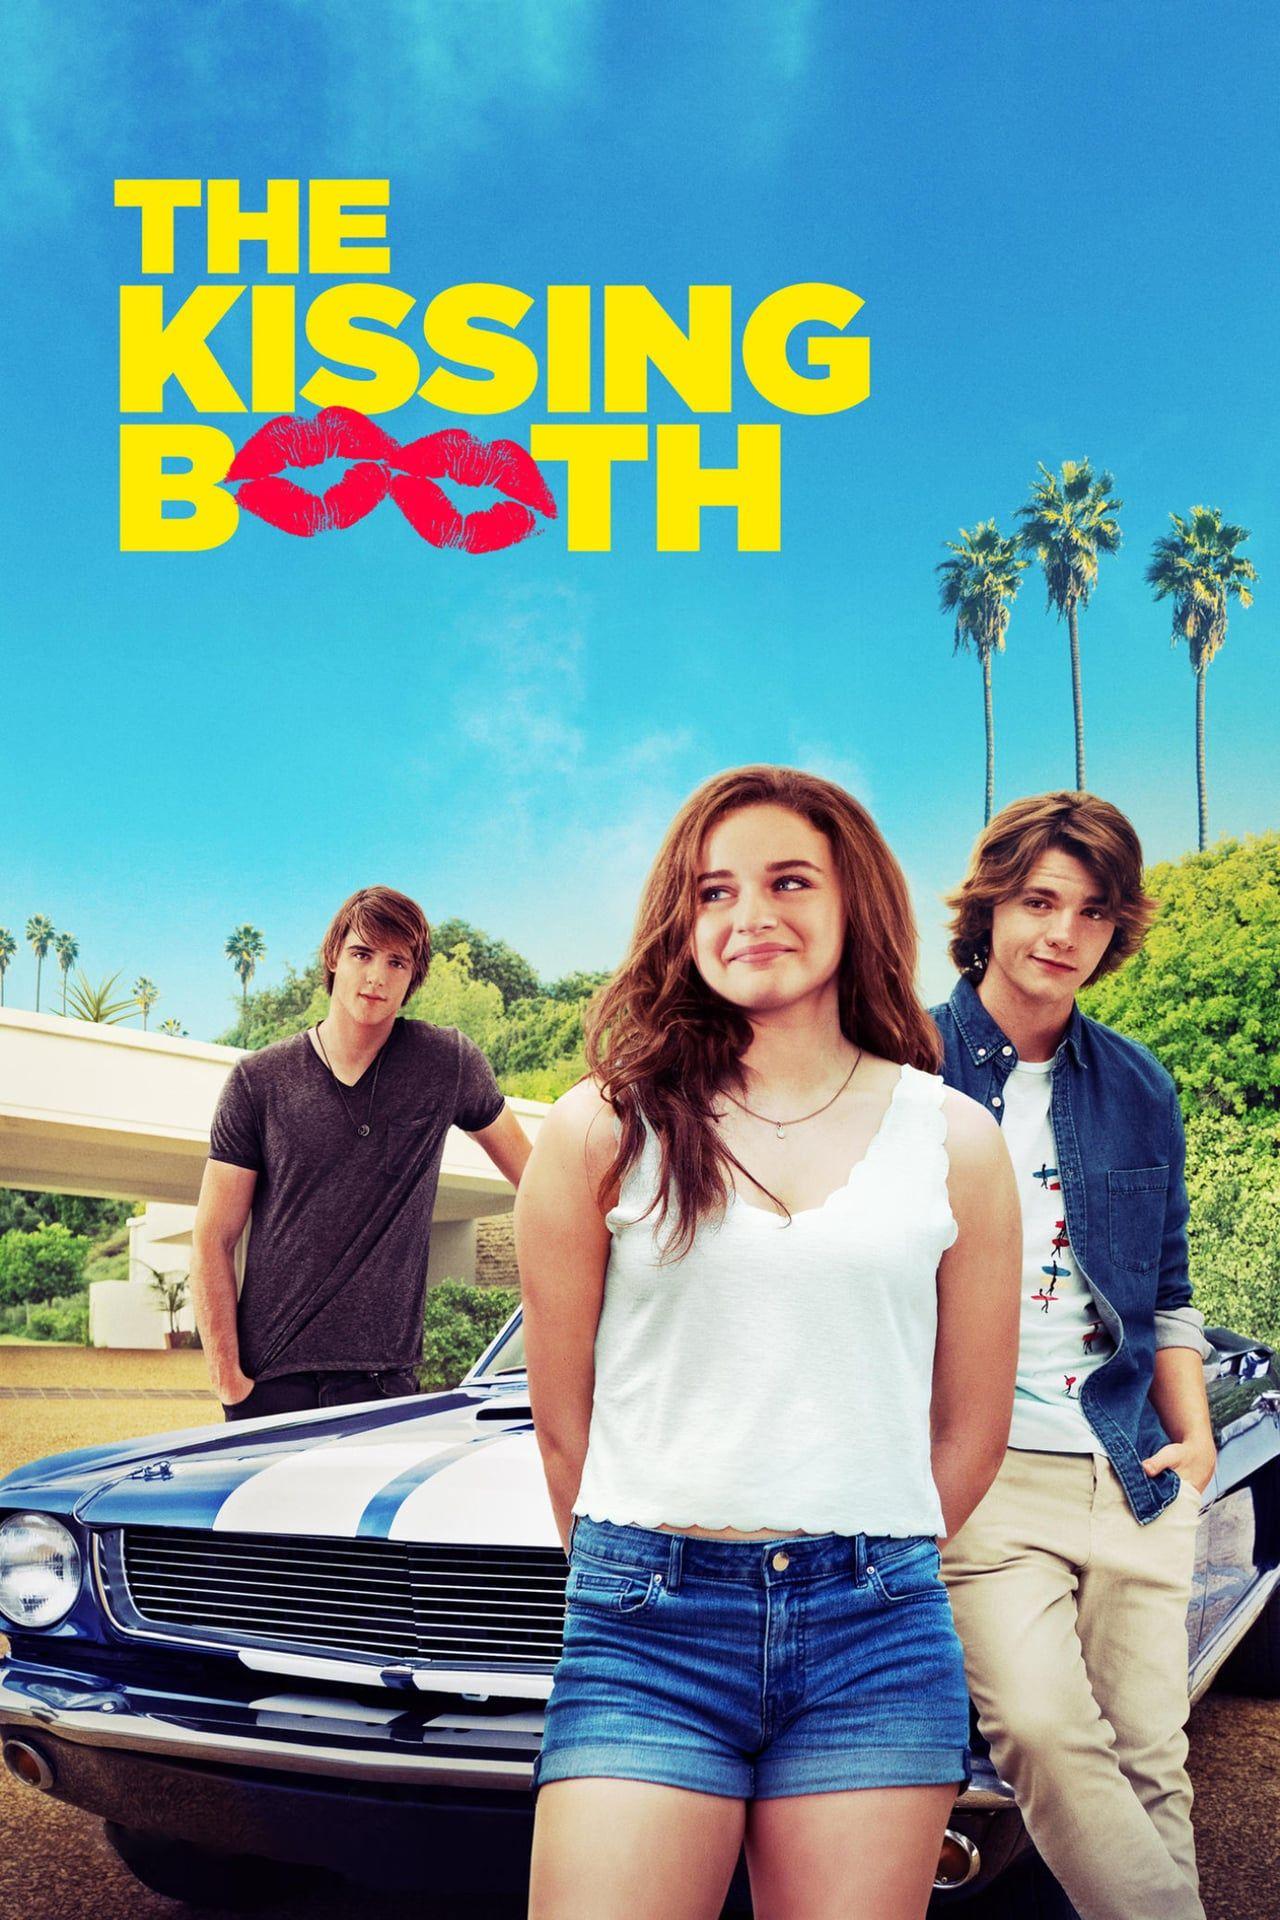 Descargar The Kissing Booth 2018 Pelicula Online Completa Subtítulos Espanol Gratis En Linea Kissing Booth Romance Movies Netflix Movies